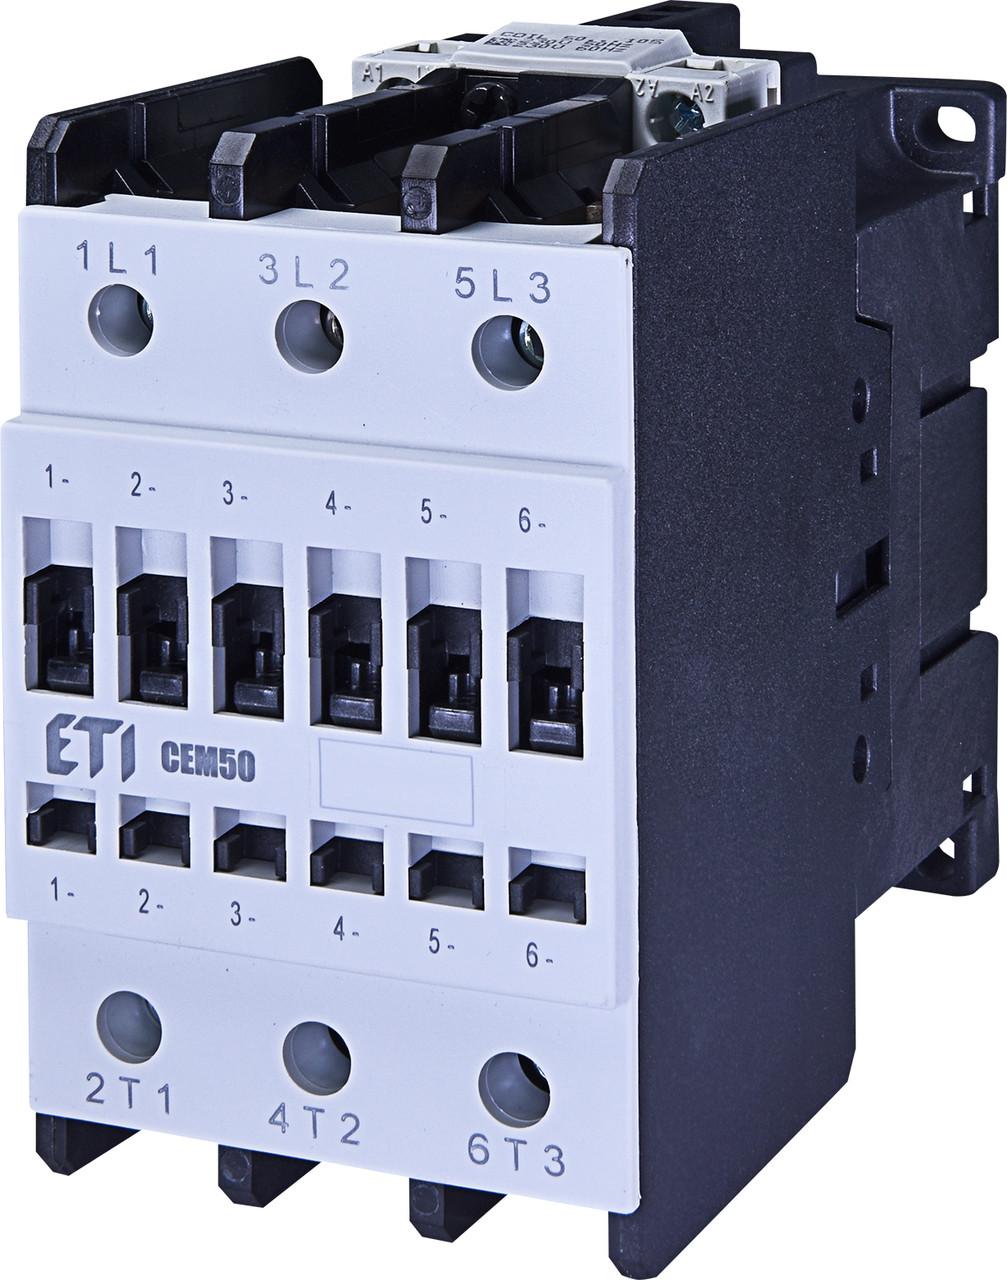 Контактор силовой ETI CEM 50.00 50А 230V AC 3NO 22kW 4648103 (на DIN-рейку, 80A AC1, 50A AC3)